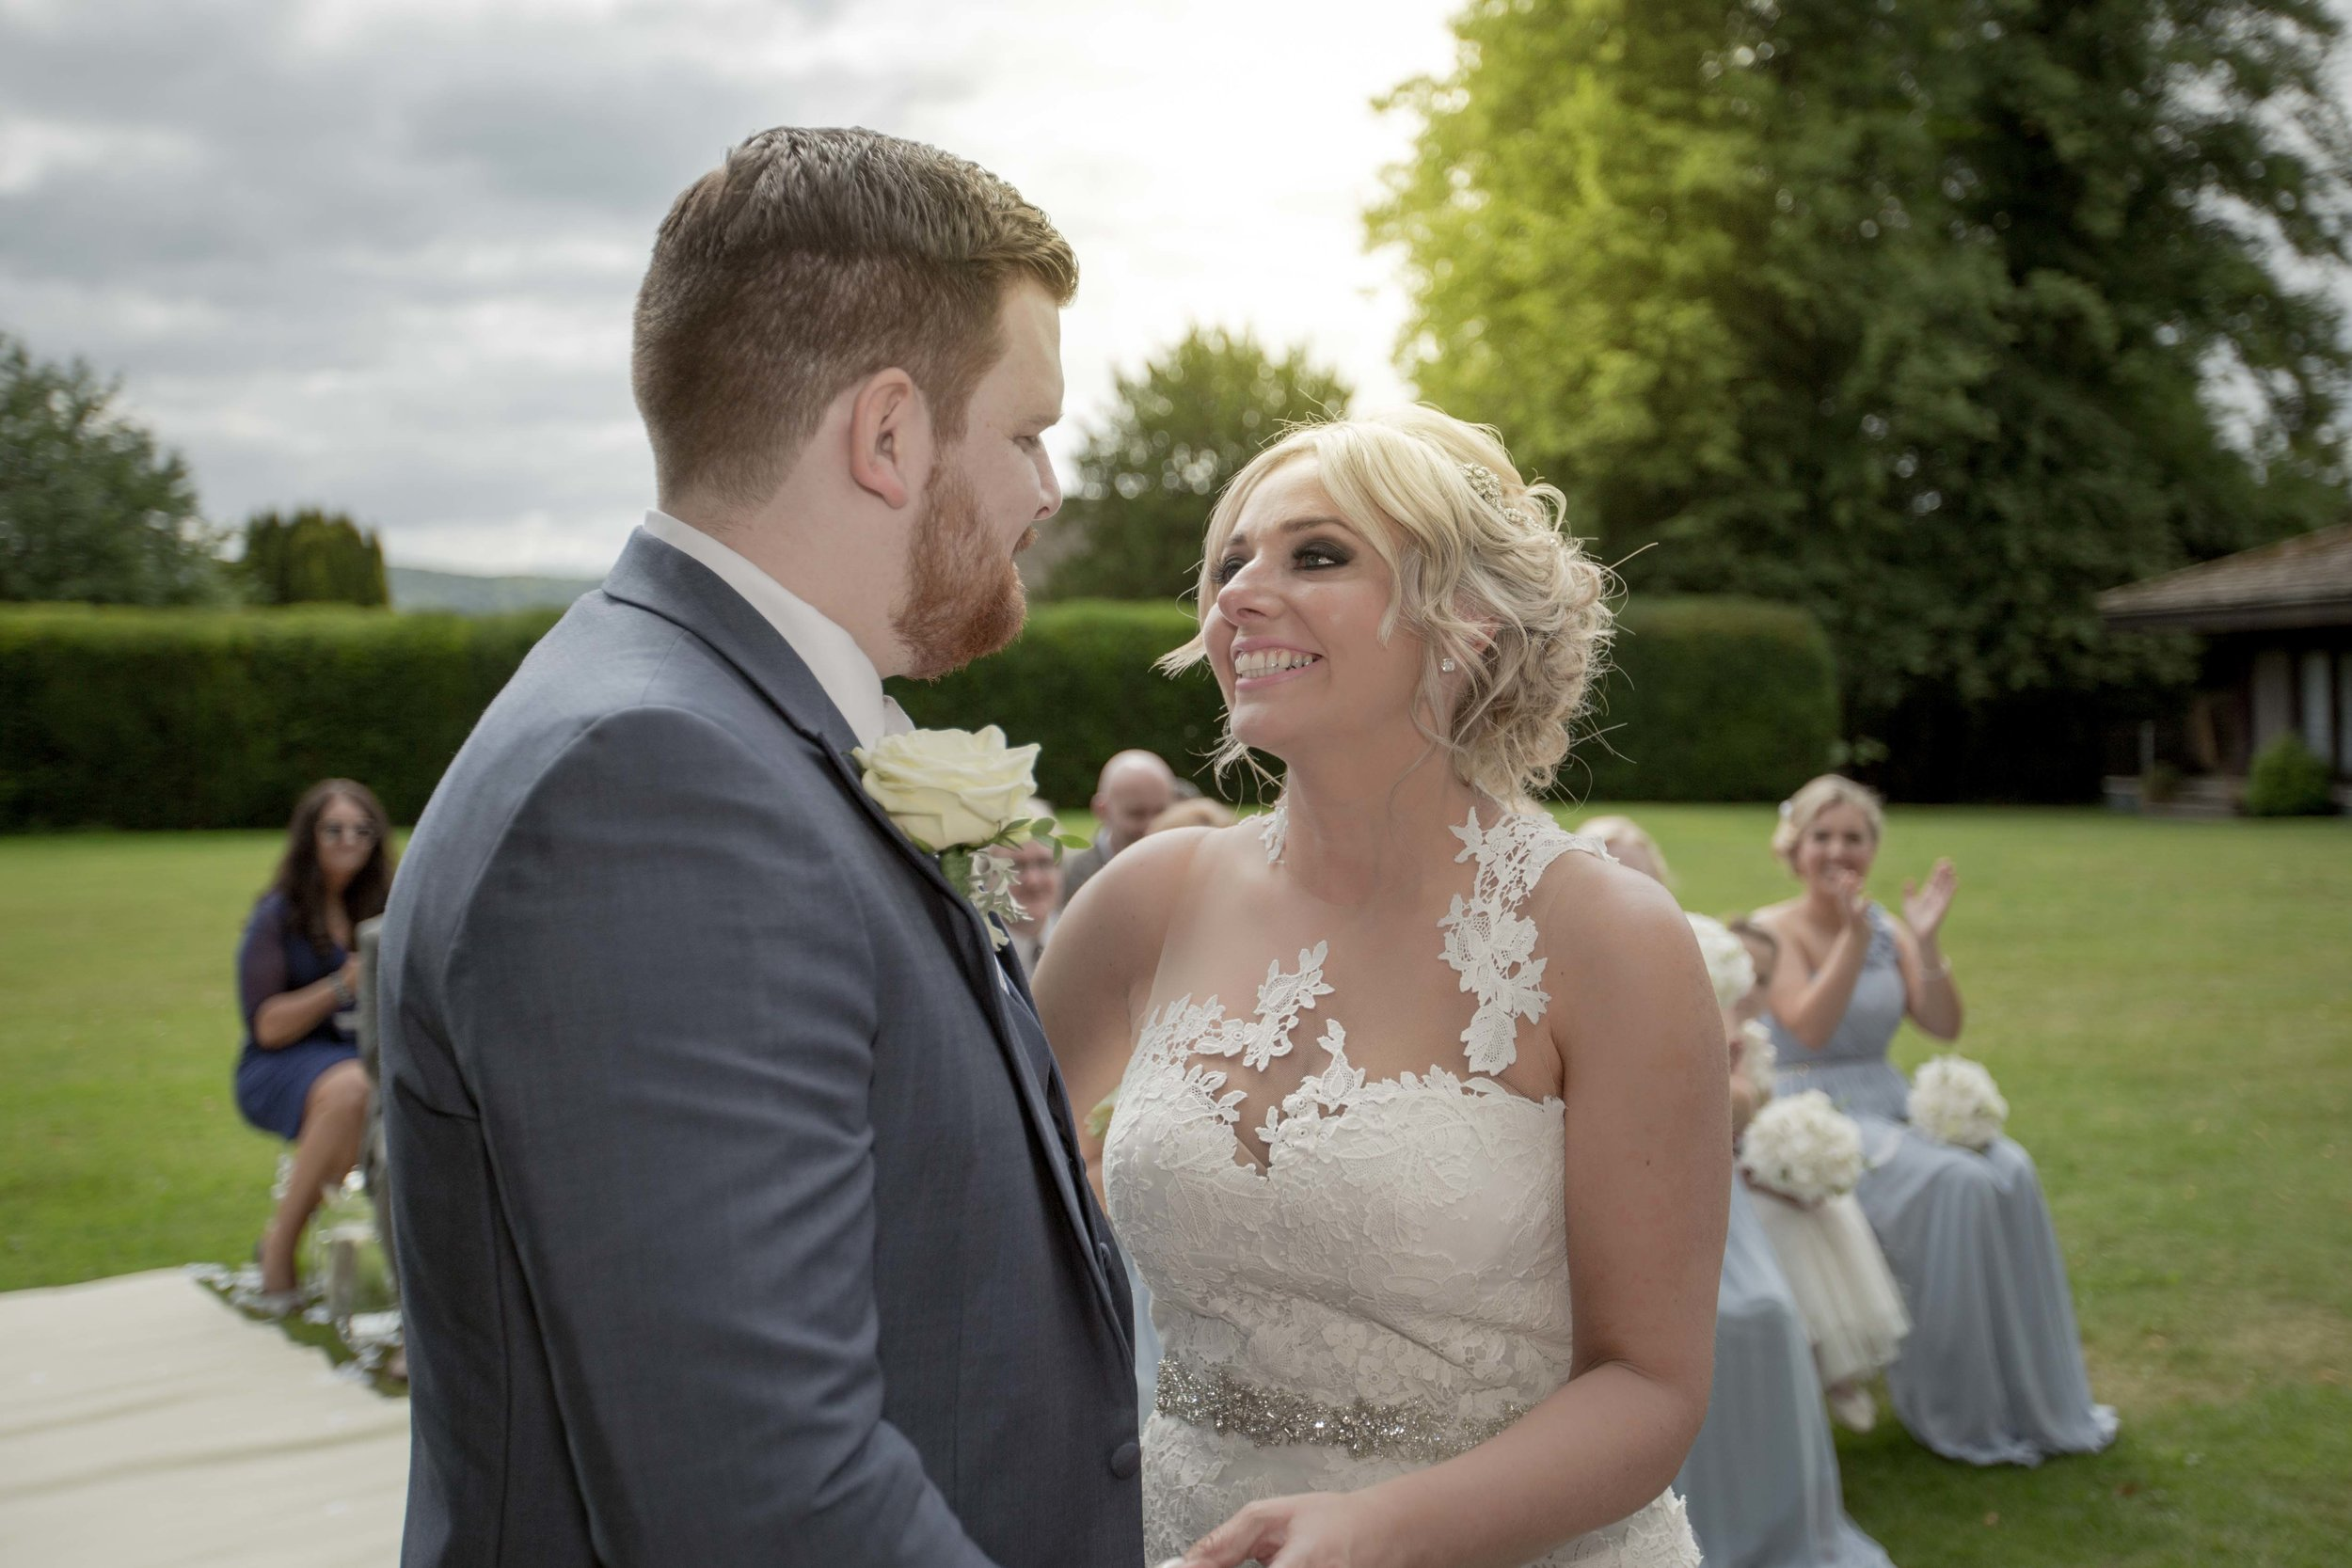 cotswold-wedding-photography-at-stonehouse-court-hotel-natalia-smith-photography-gloucestershire-wedding-photographer-43.jpg